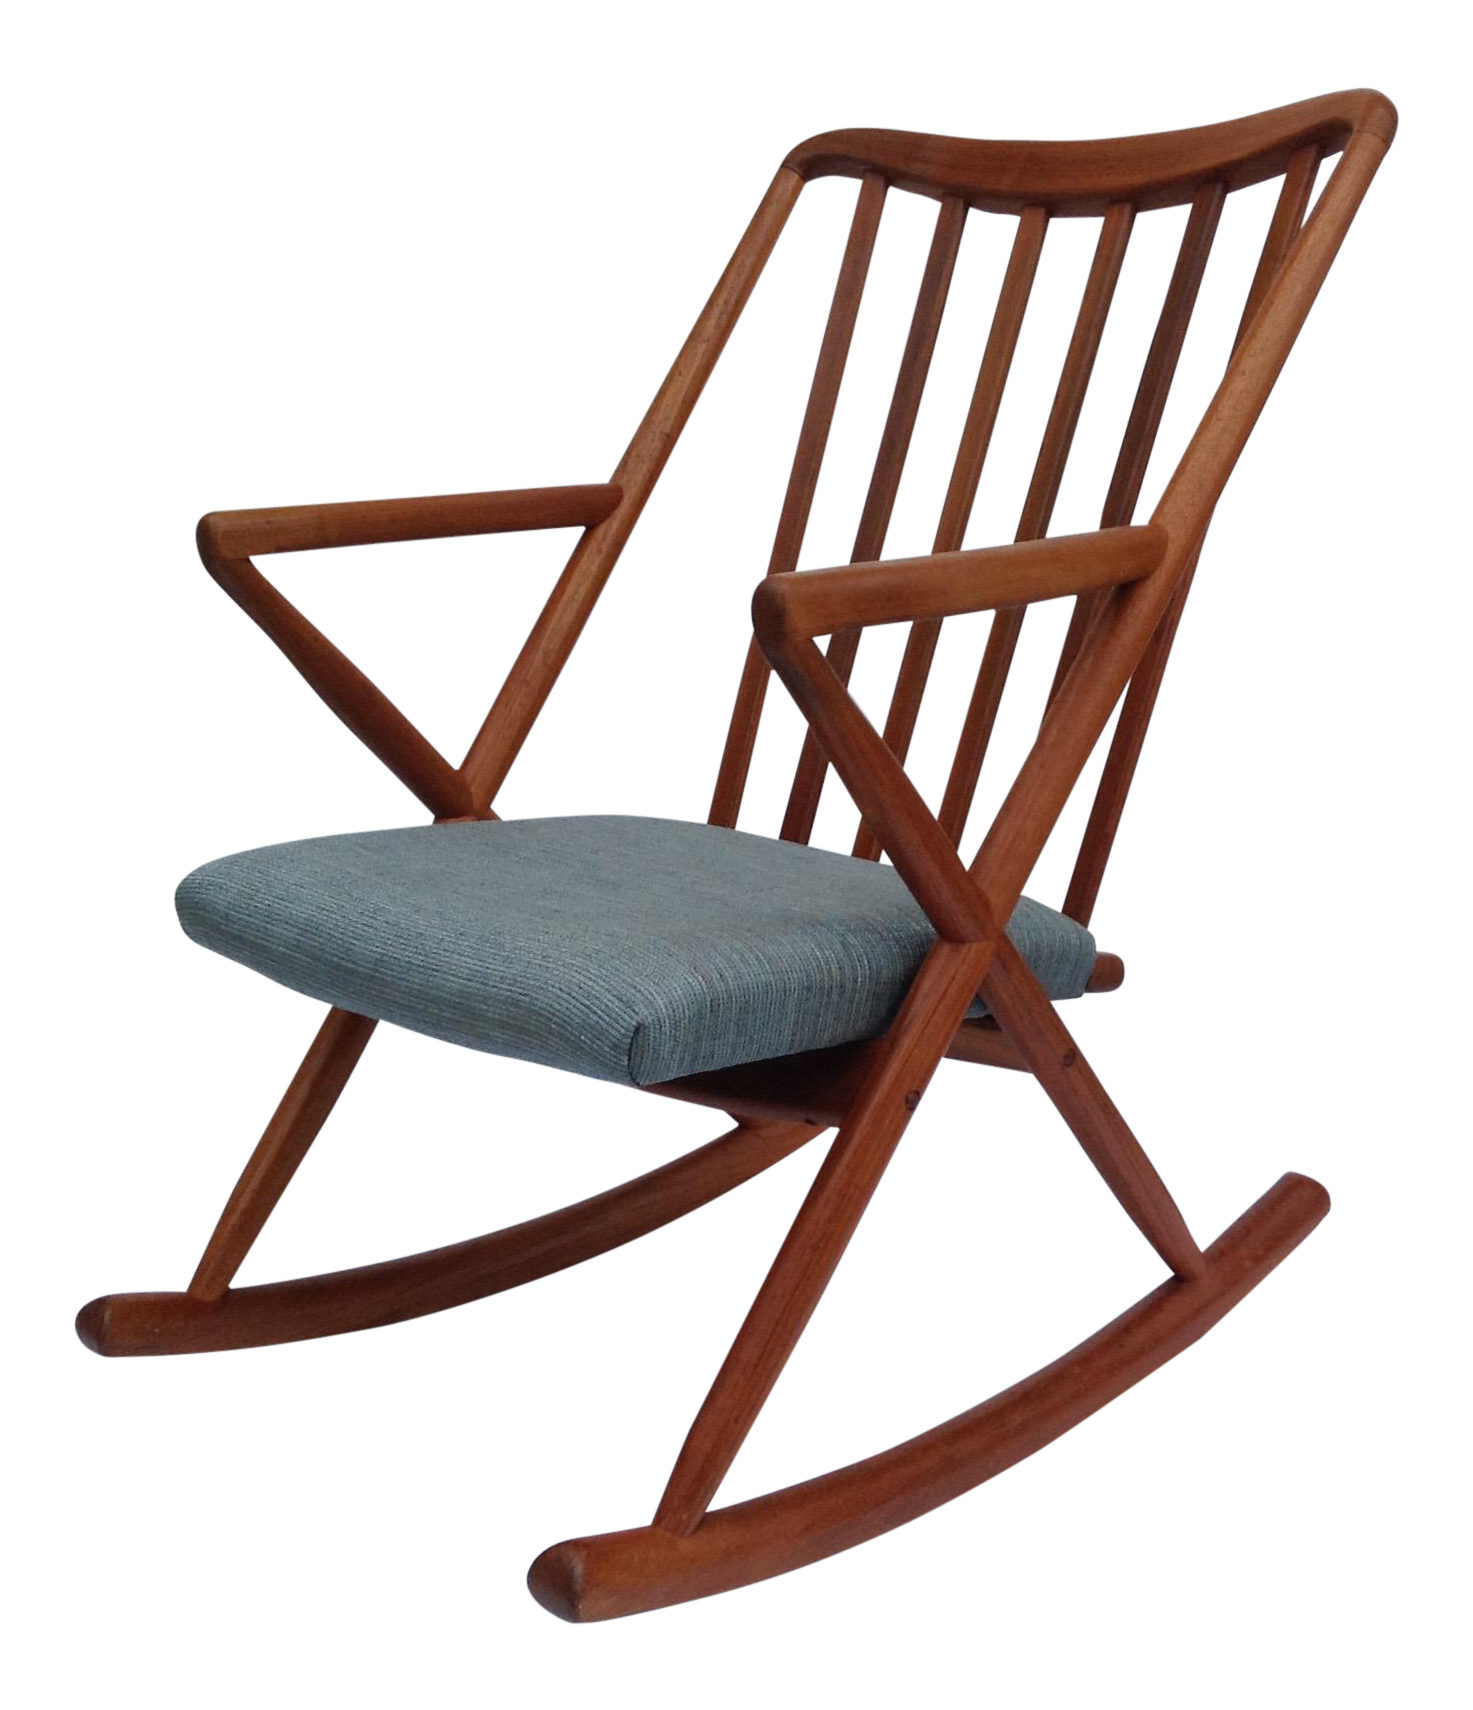 Benny Linden Danish Mid Century Teak Rocking Chair Chairish